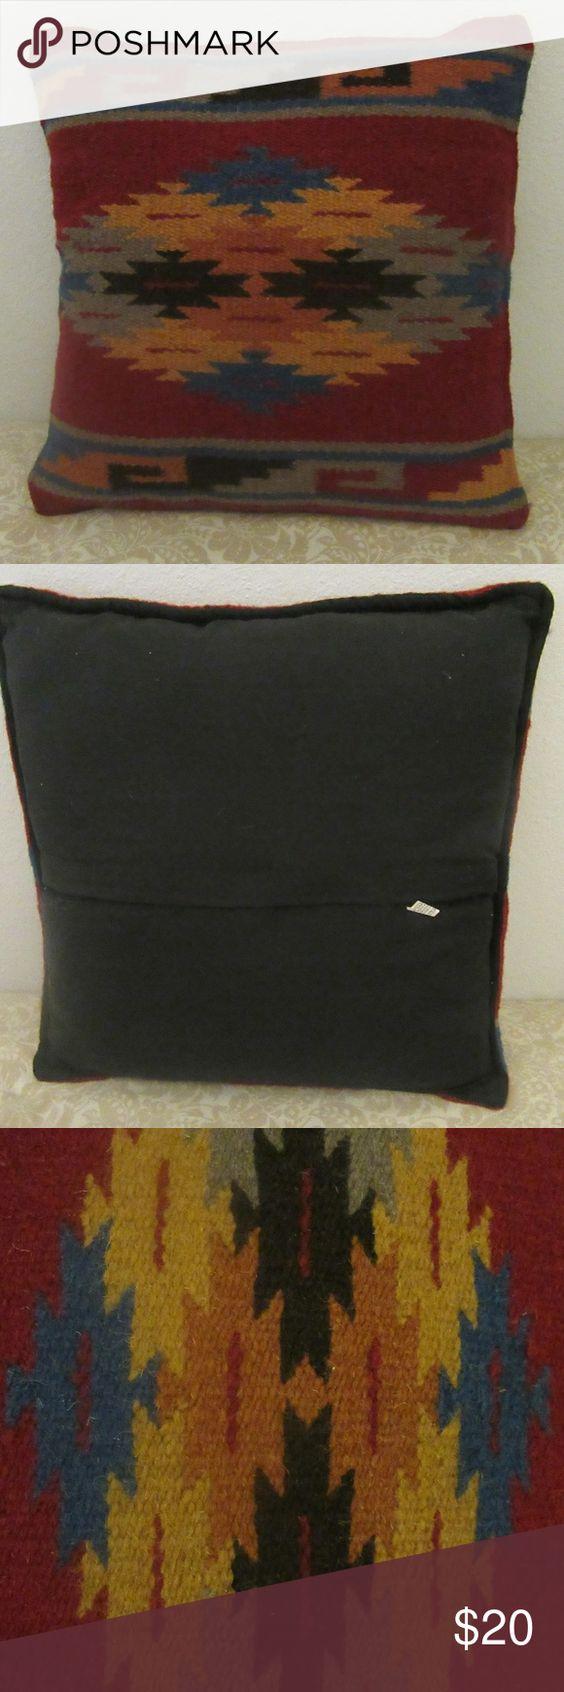 Southwestern Styled El Paso Saddle Blanket Pillow Great Shape Southwestern  Styled El Paso Saddle Blanket Pillow